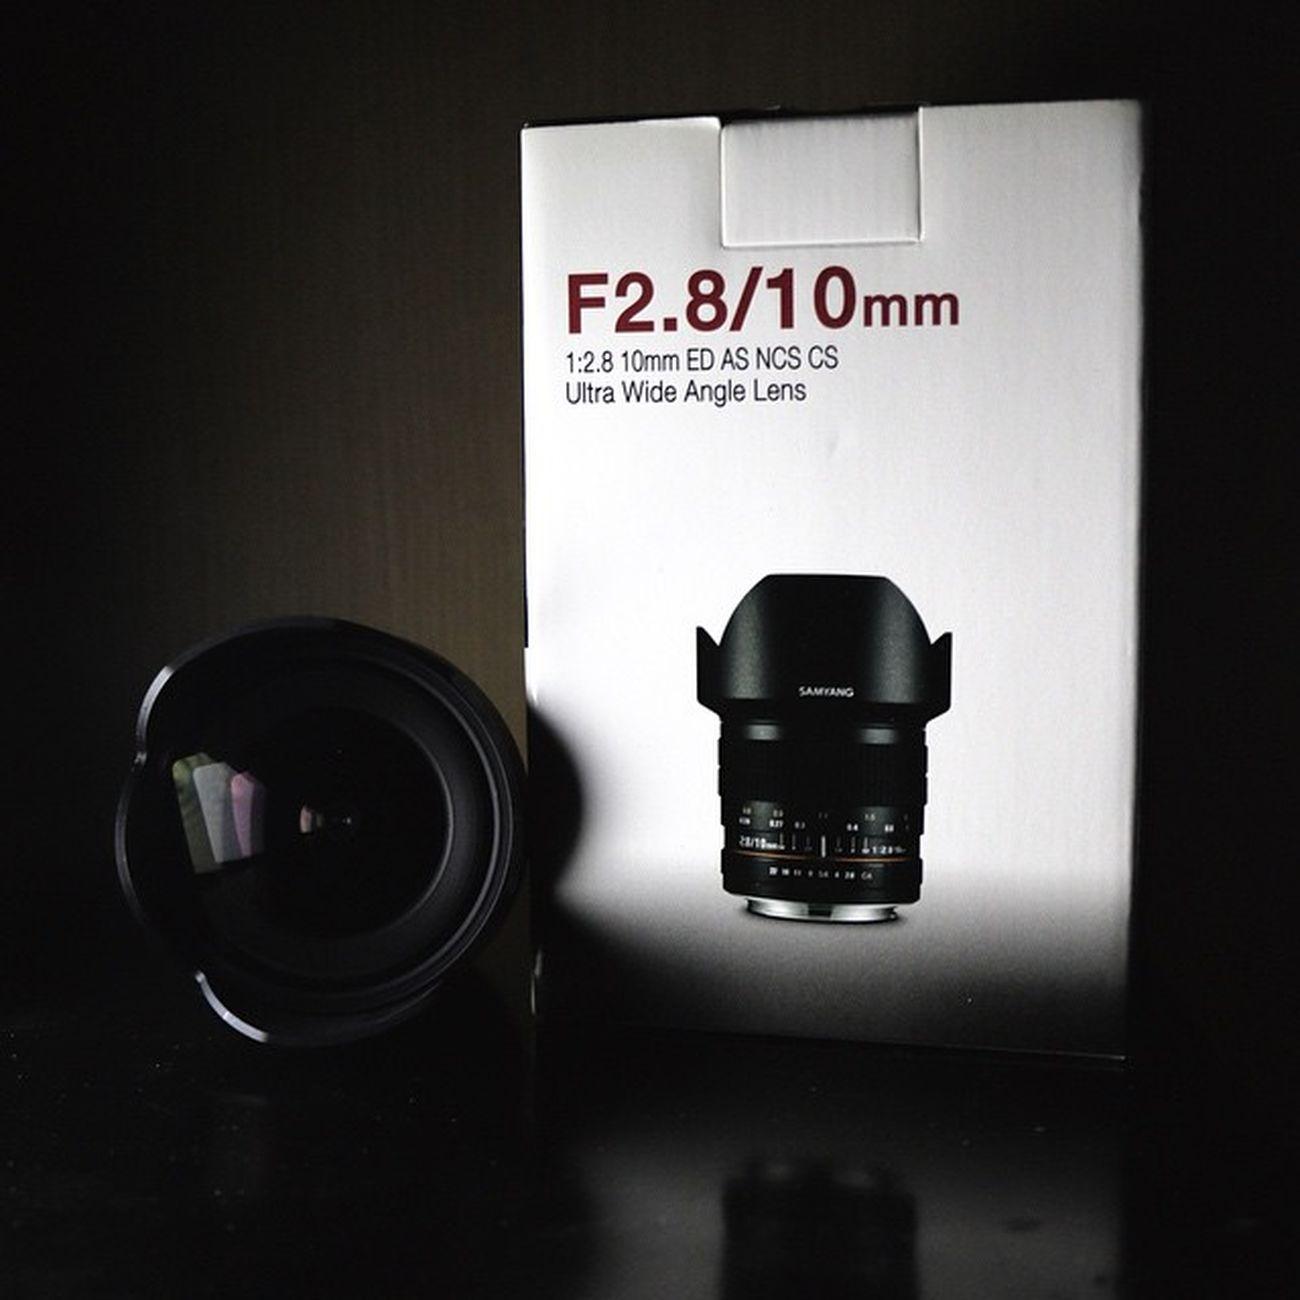 New Toy 新玩具入手 今次玩韓國鏡 Samyang 10mm f/2.8 ED AS NCS CS 三千蚊都唔洗就可以體驗超廣角大光圈 正爆 做工實在 光圈同對焦環順暢 手動鏡又夠復古 Pbhk Milkfoto Samyang 10mm Canon 70d Ultrawide Ultrawideangle Newlens Prime Lens Madeinkorea